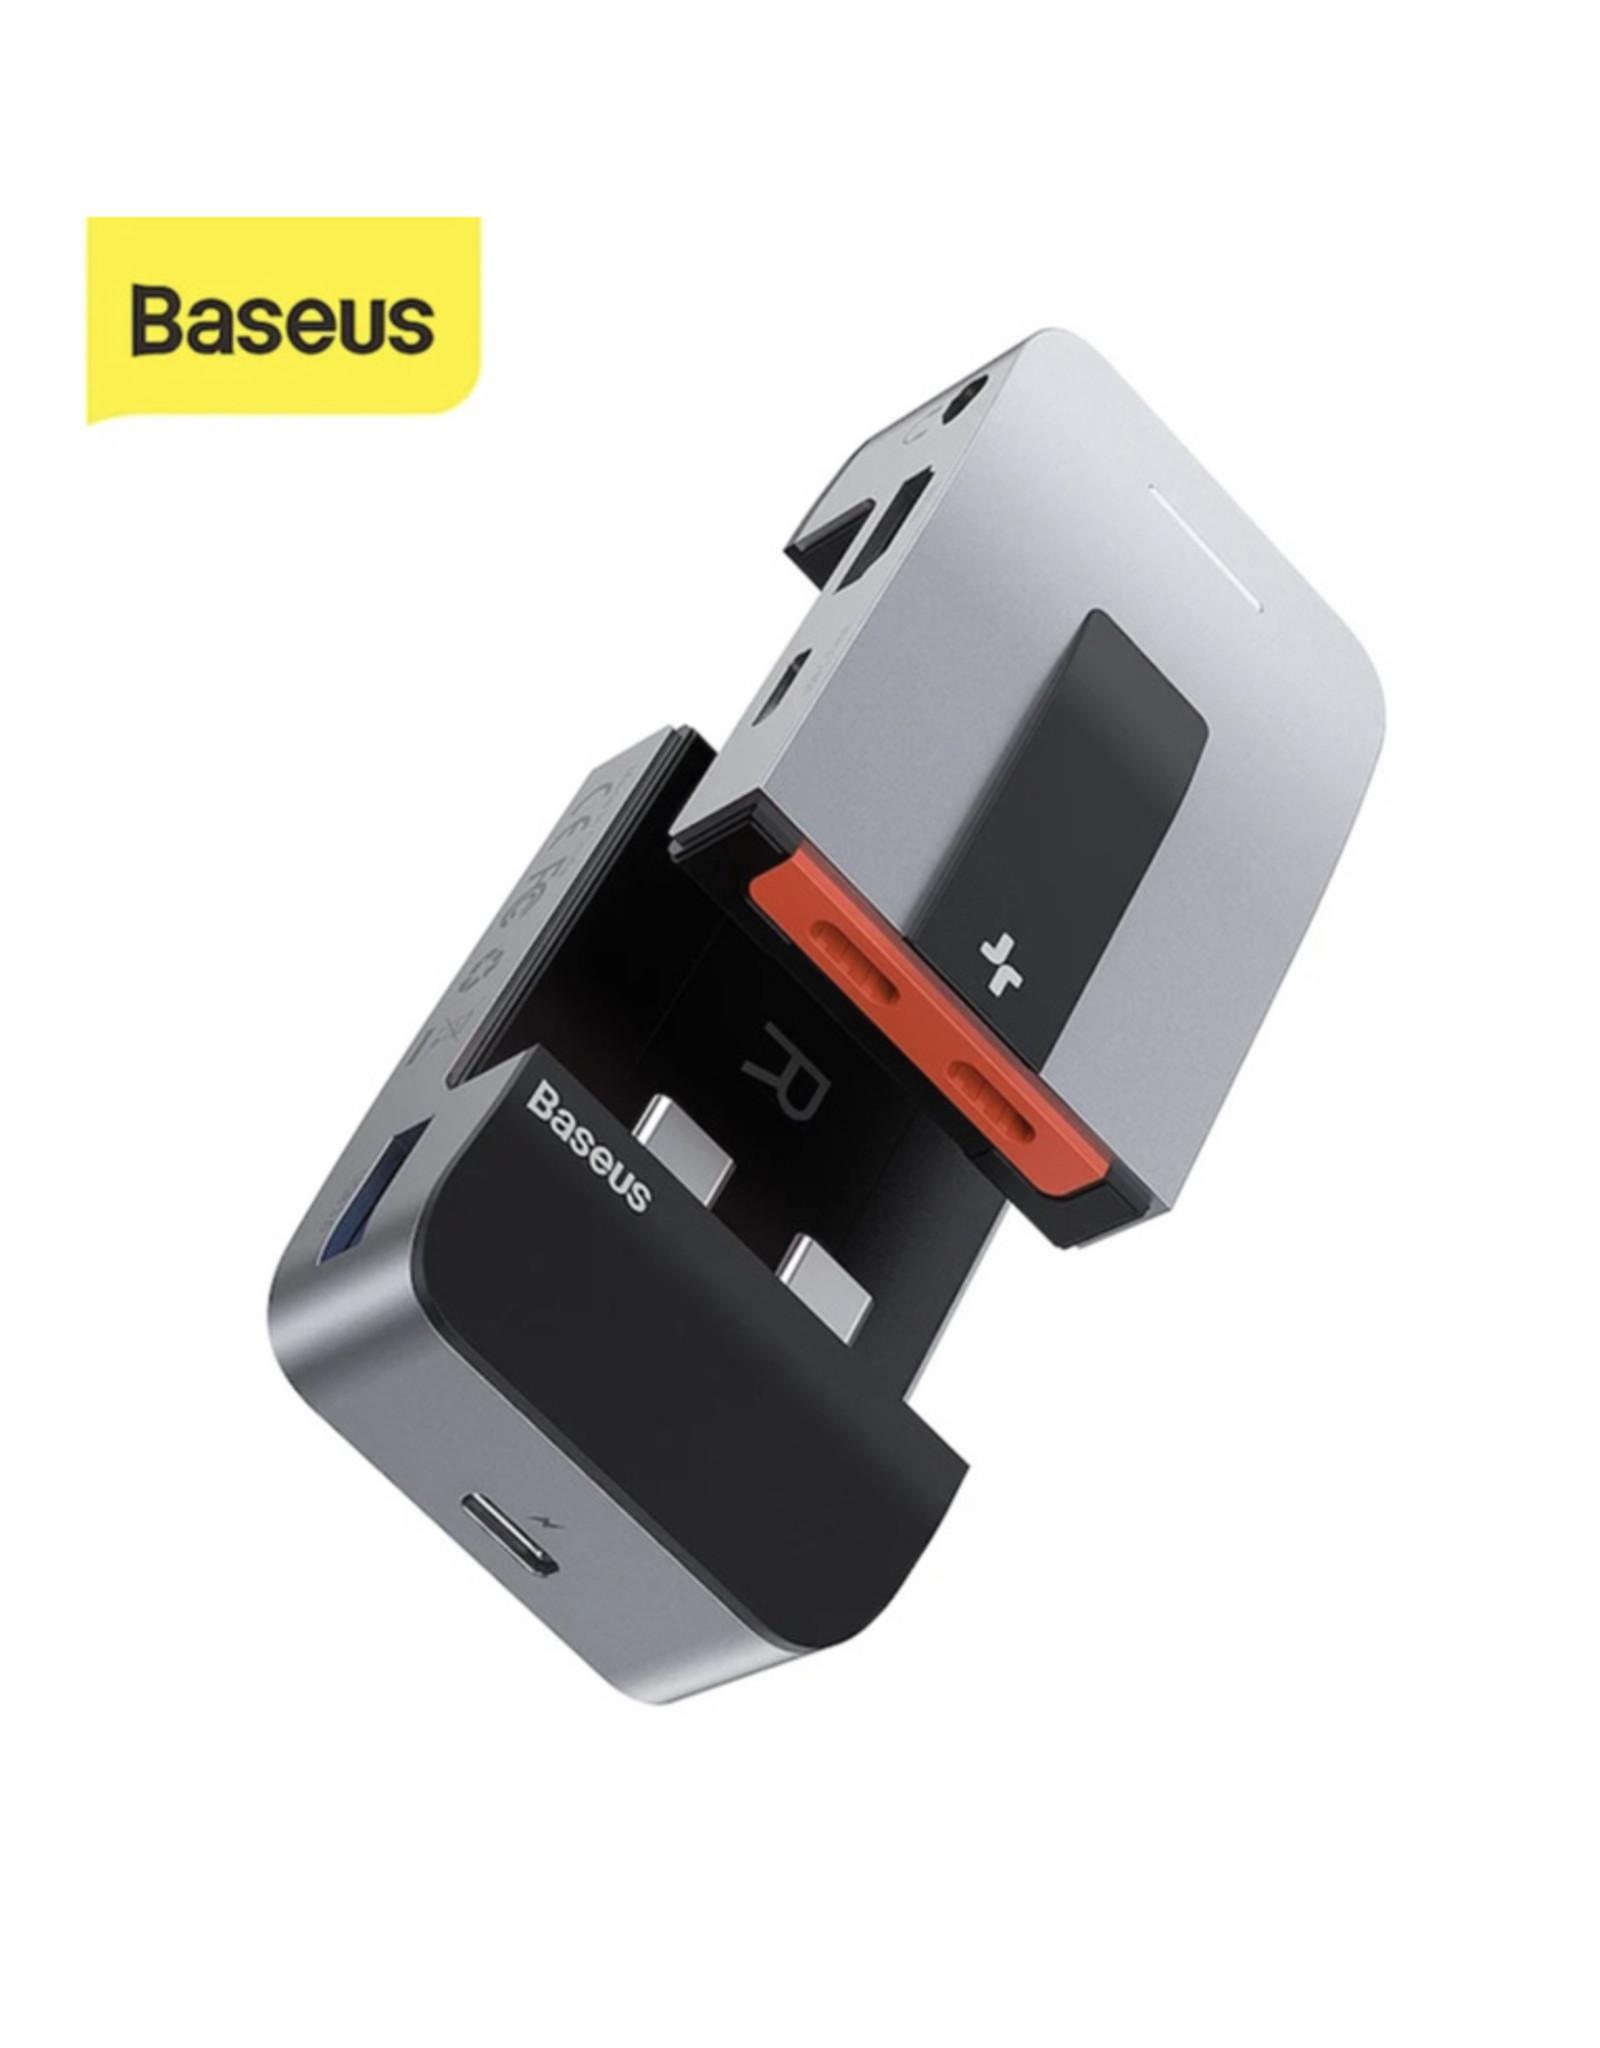 Baseus BASEUS Multifunctional Hub Adapter